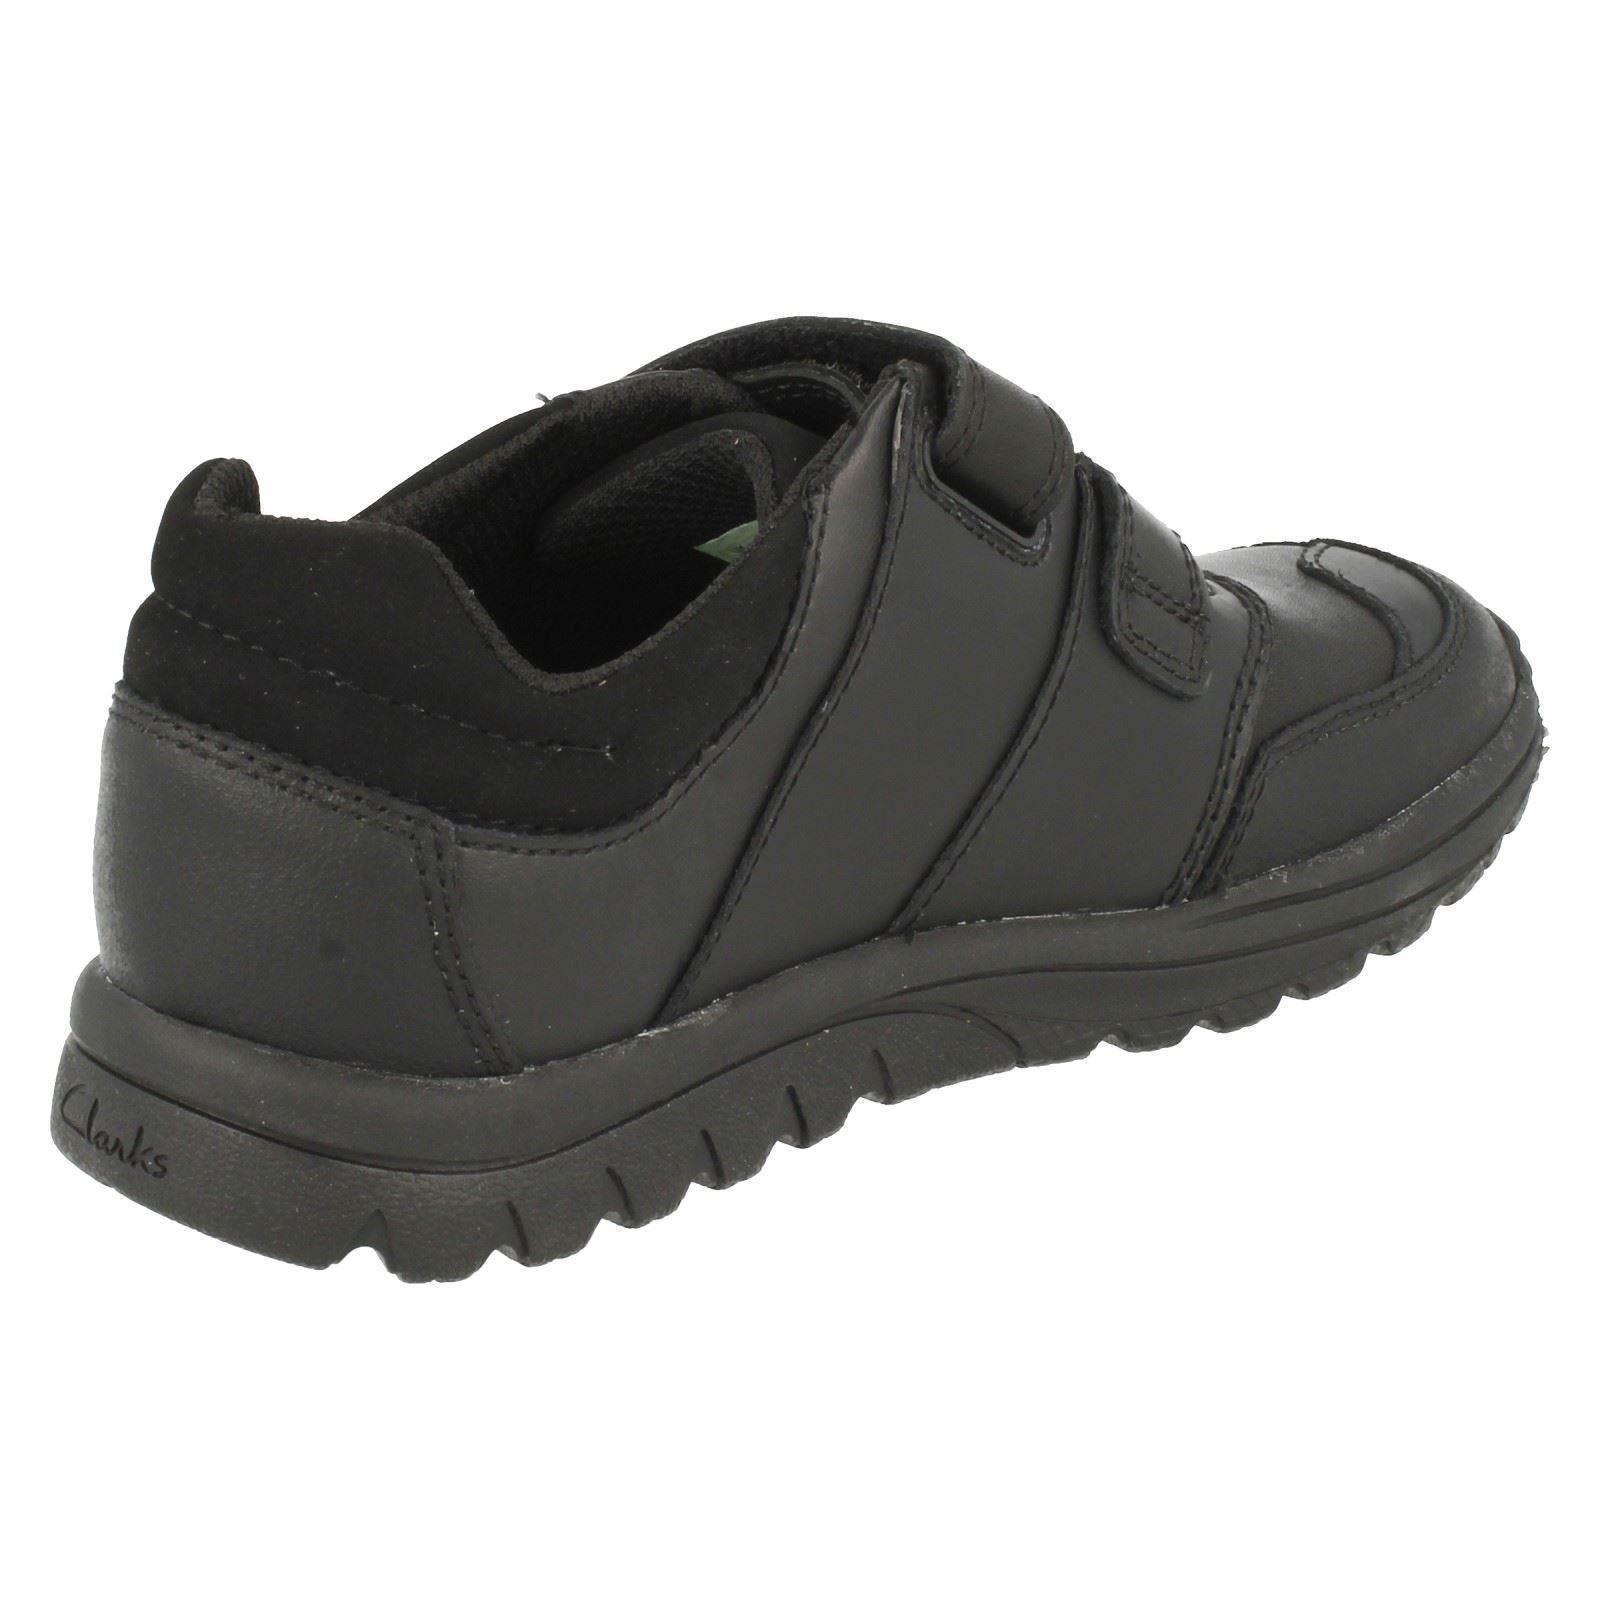 Boys Clarks School Shoes /'Jack Spring/'